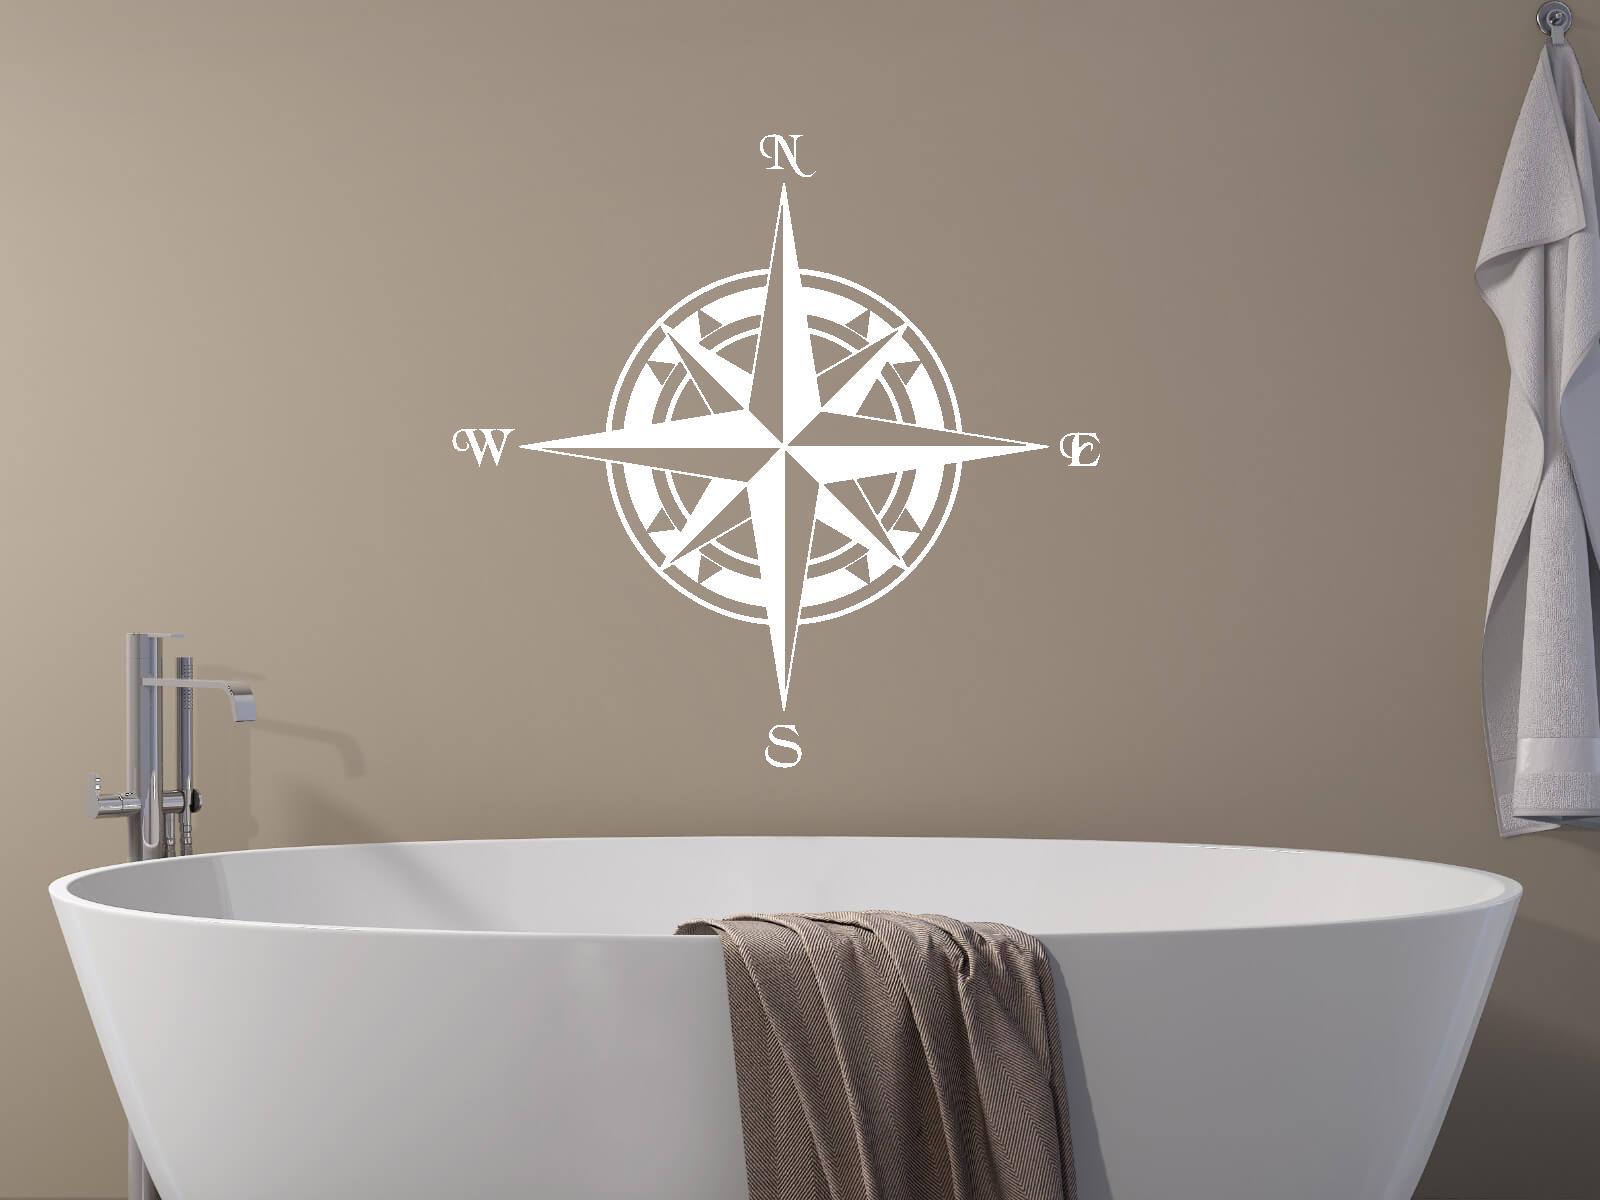 Wandtattoo kompass tocut werbetechnik wandtattoo - Wandtattoo kompass ...